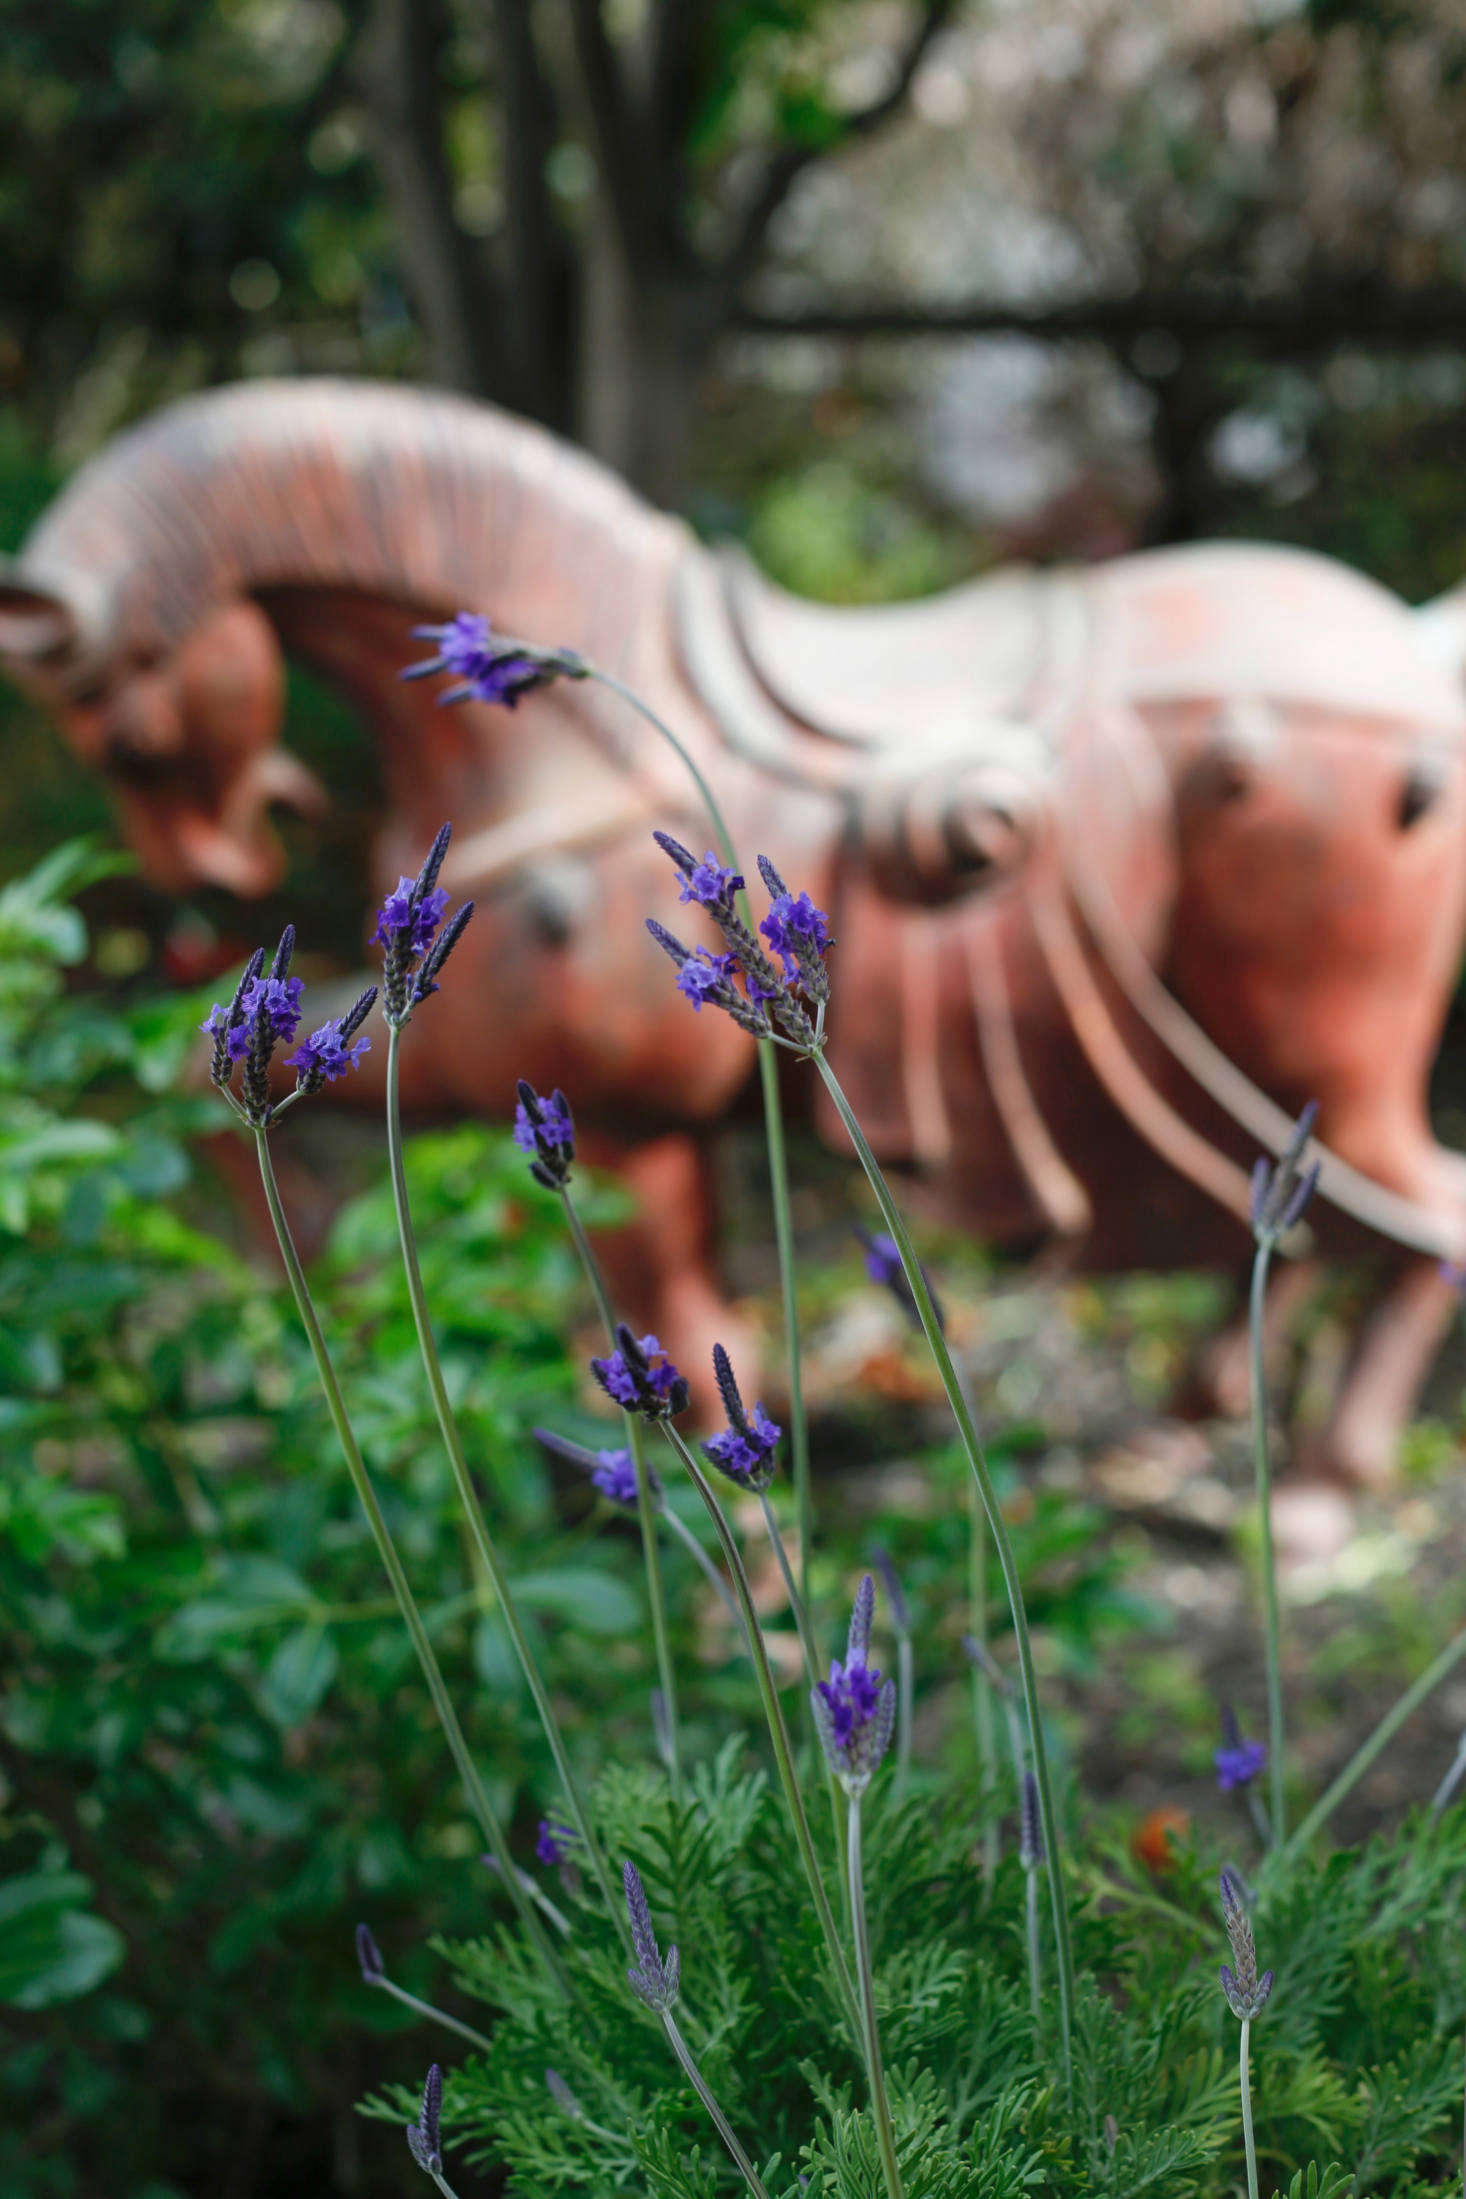 Jagged lavender (L. pinnata buchii) has feathery leaves and deeply purple flowers.